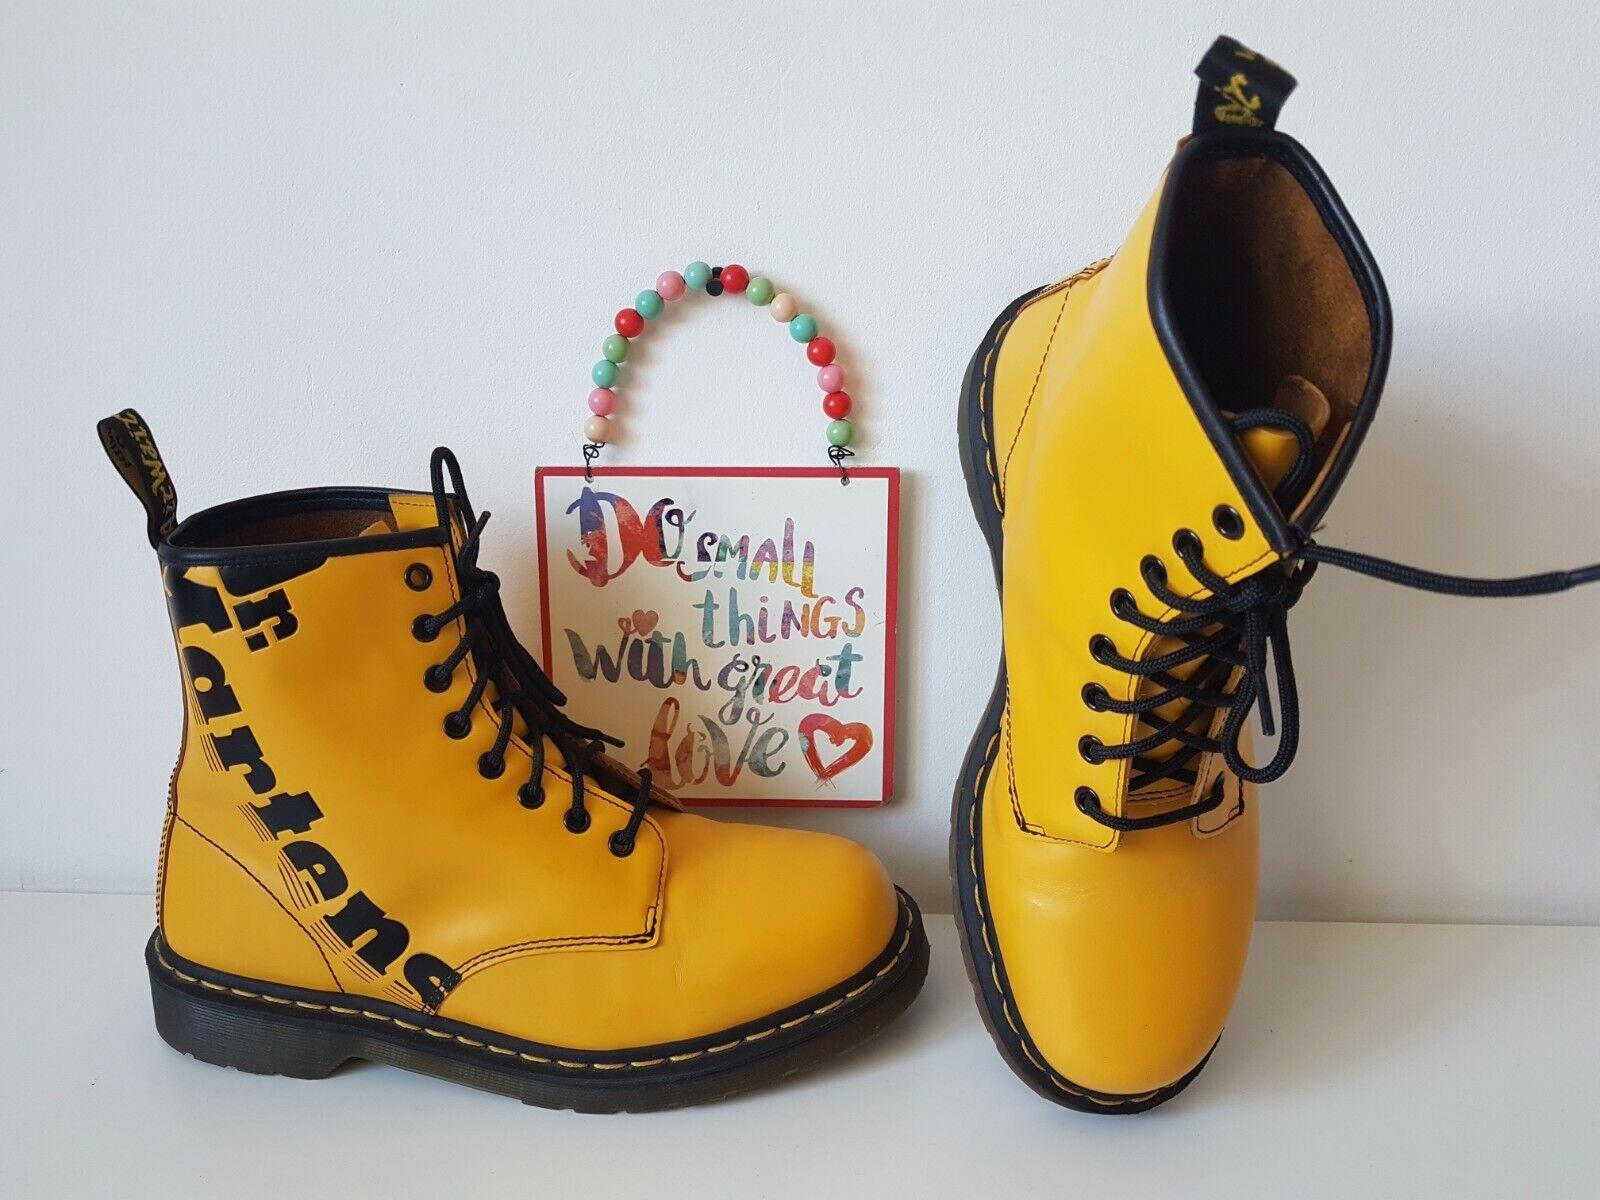 Dr Martens logo yellow ankle boots 1460 8 eyelet UK 9 EU 43 US 10